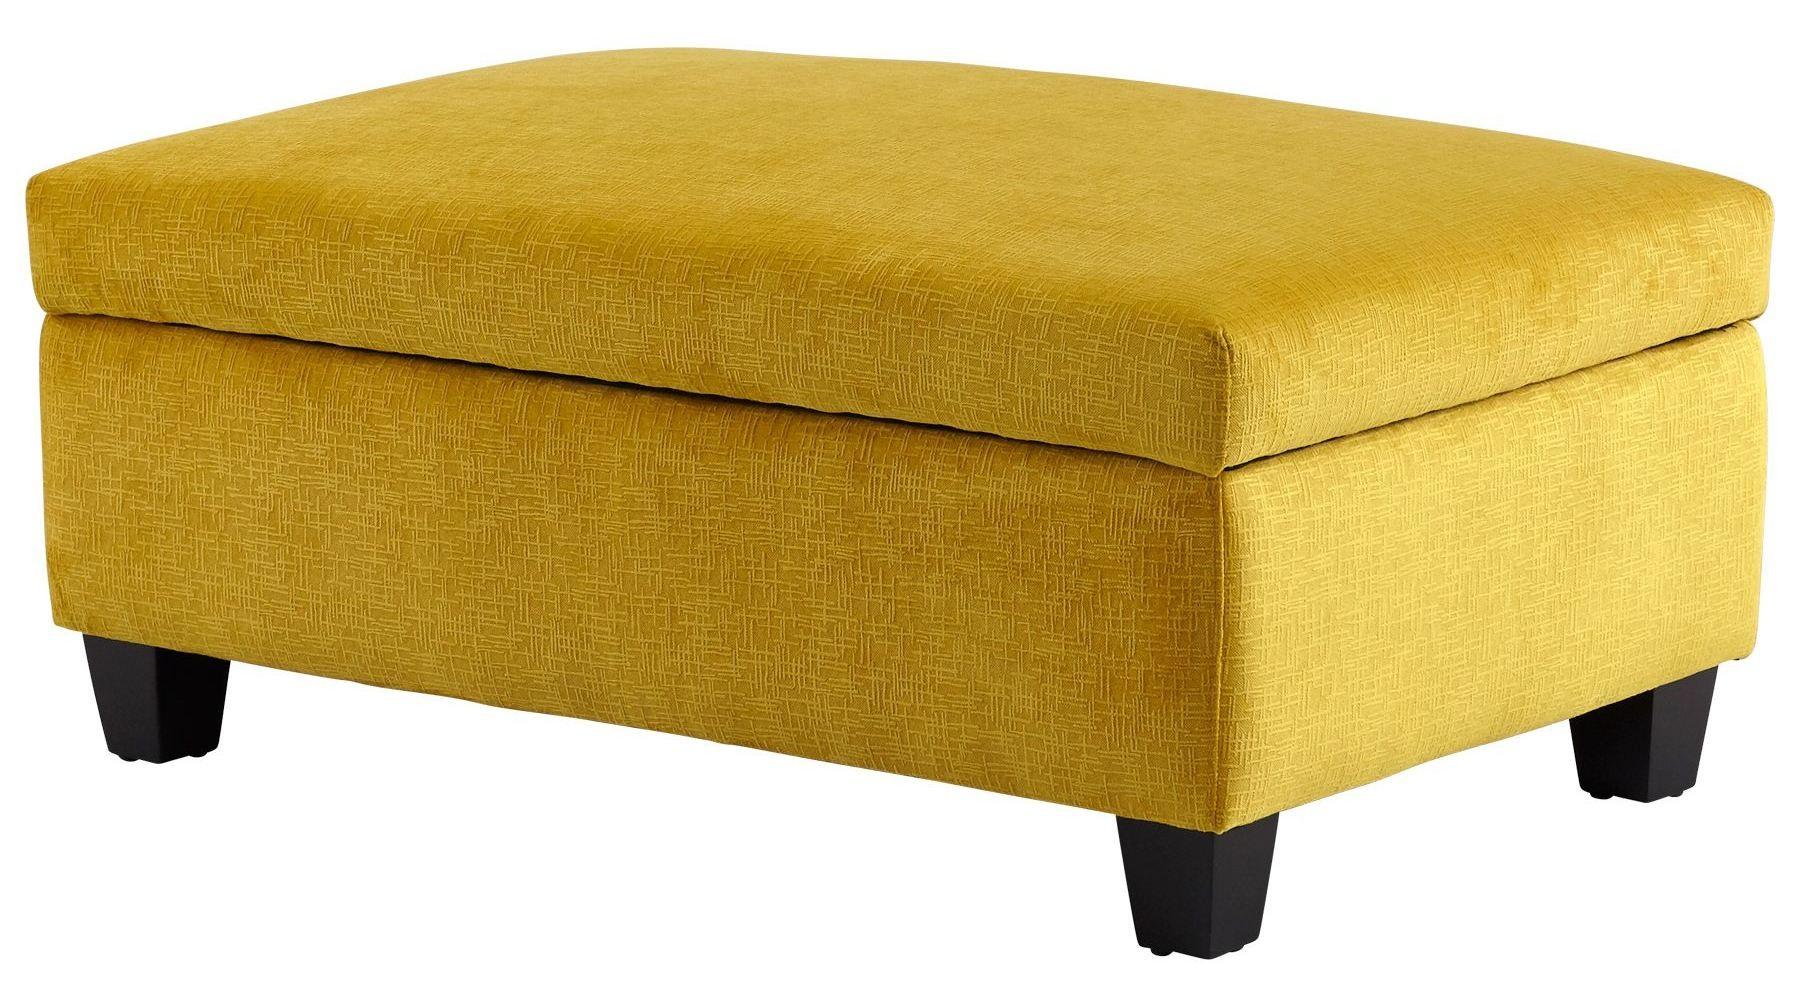 Aldous Yellow Ottoman From Cyan Design